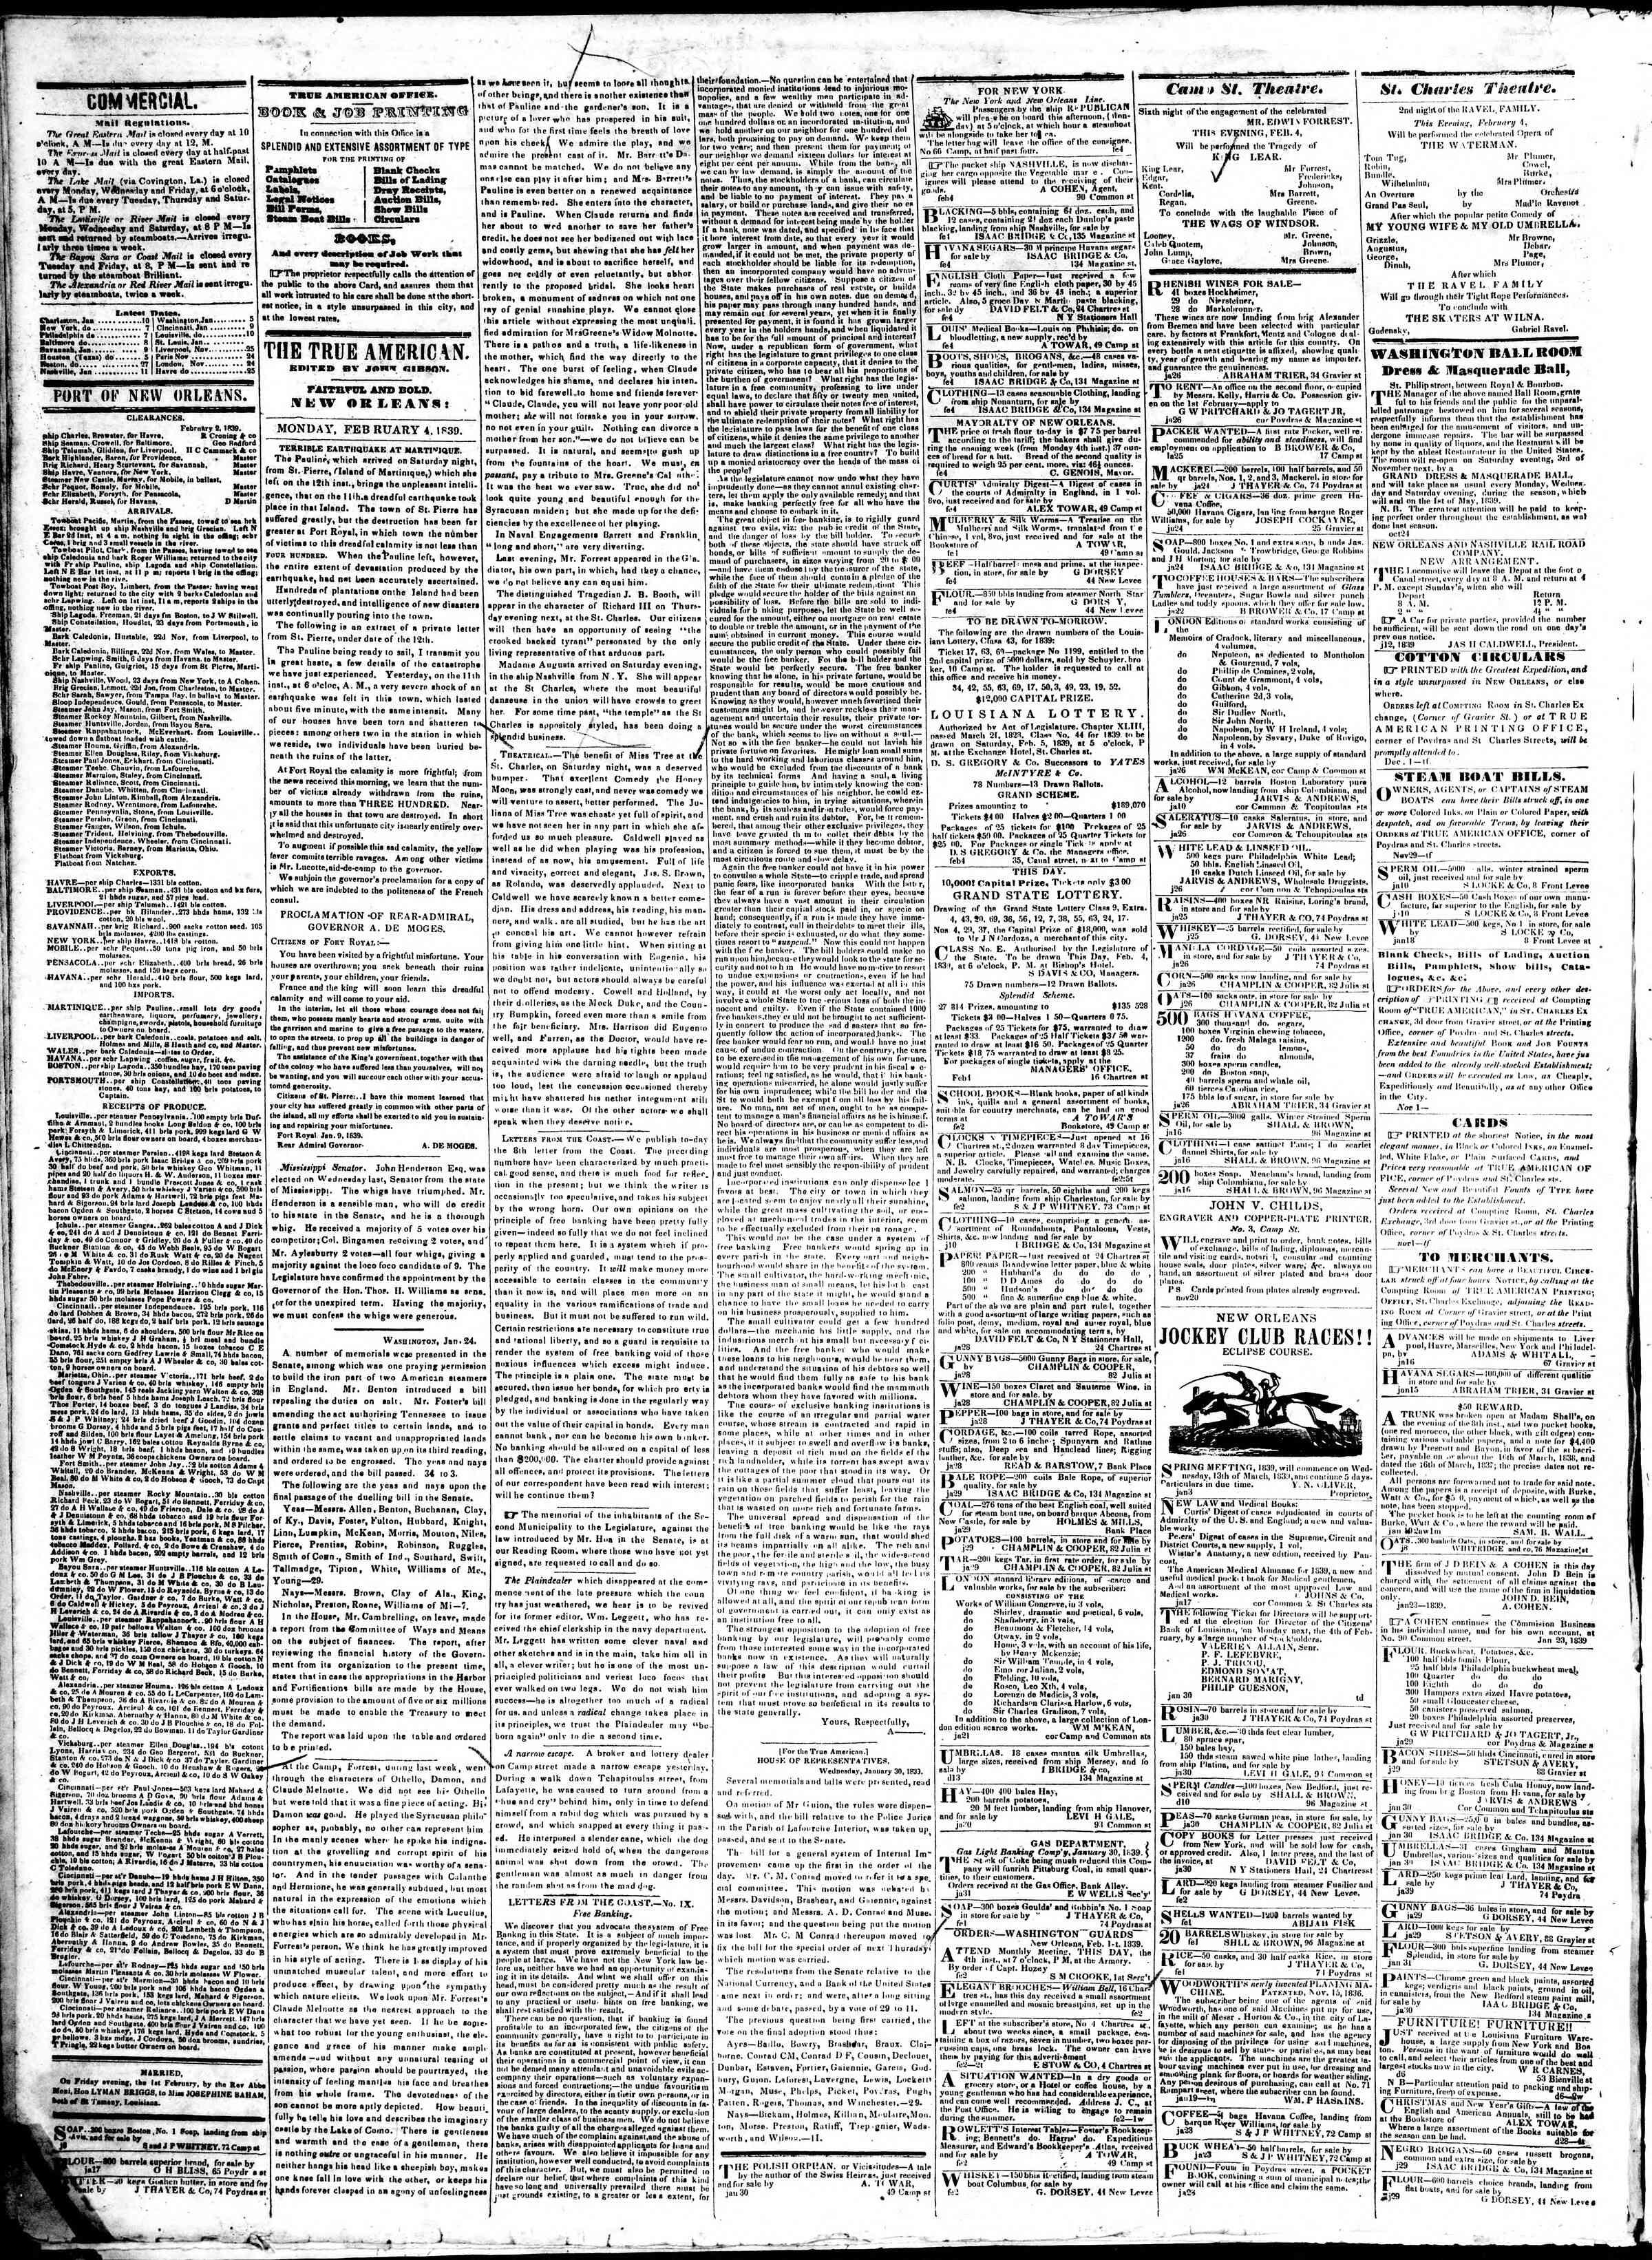 February 4, 1839 Tarihli True American Gazetesi Sayfa 2